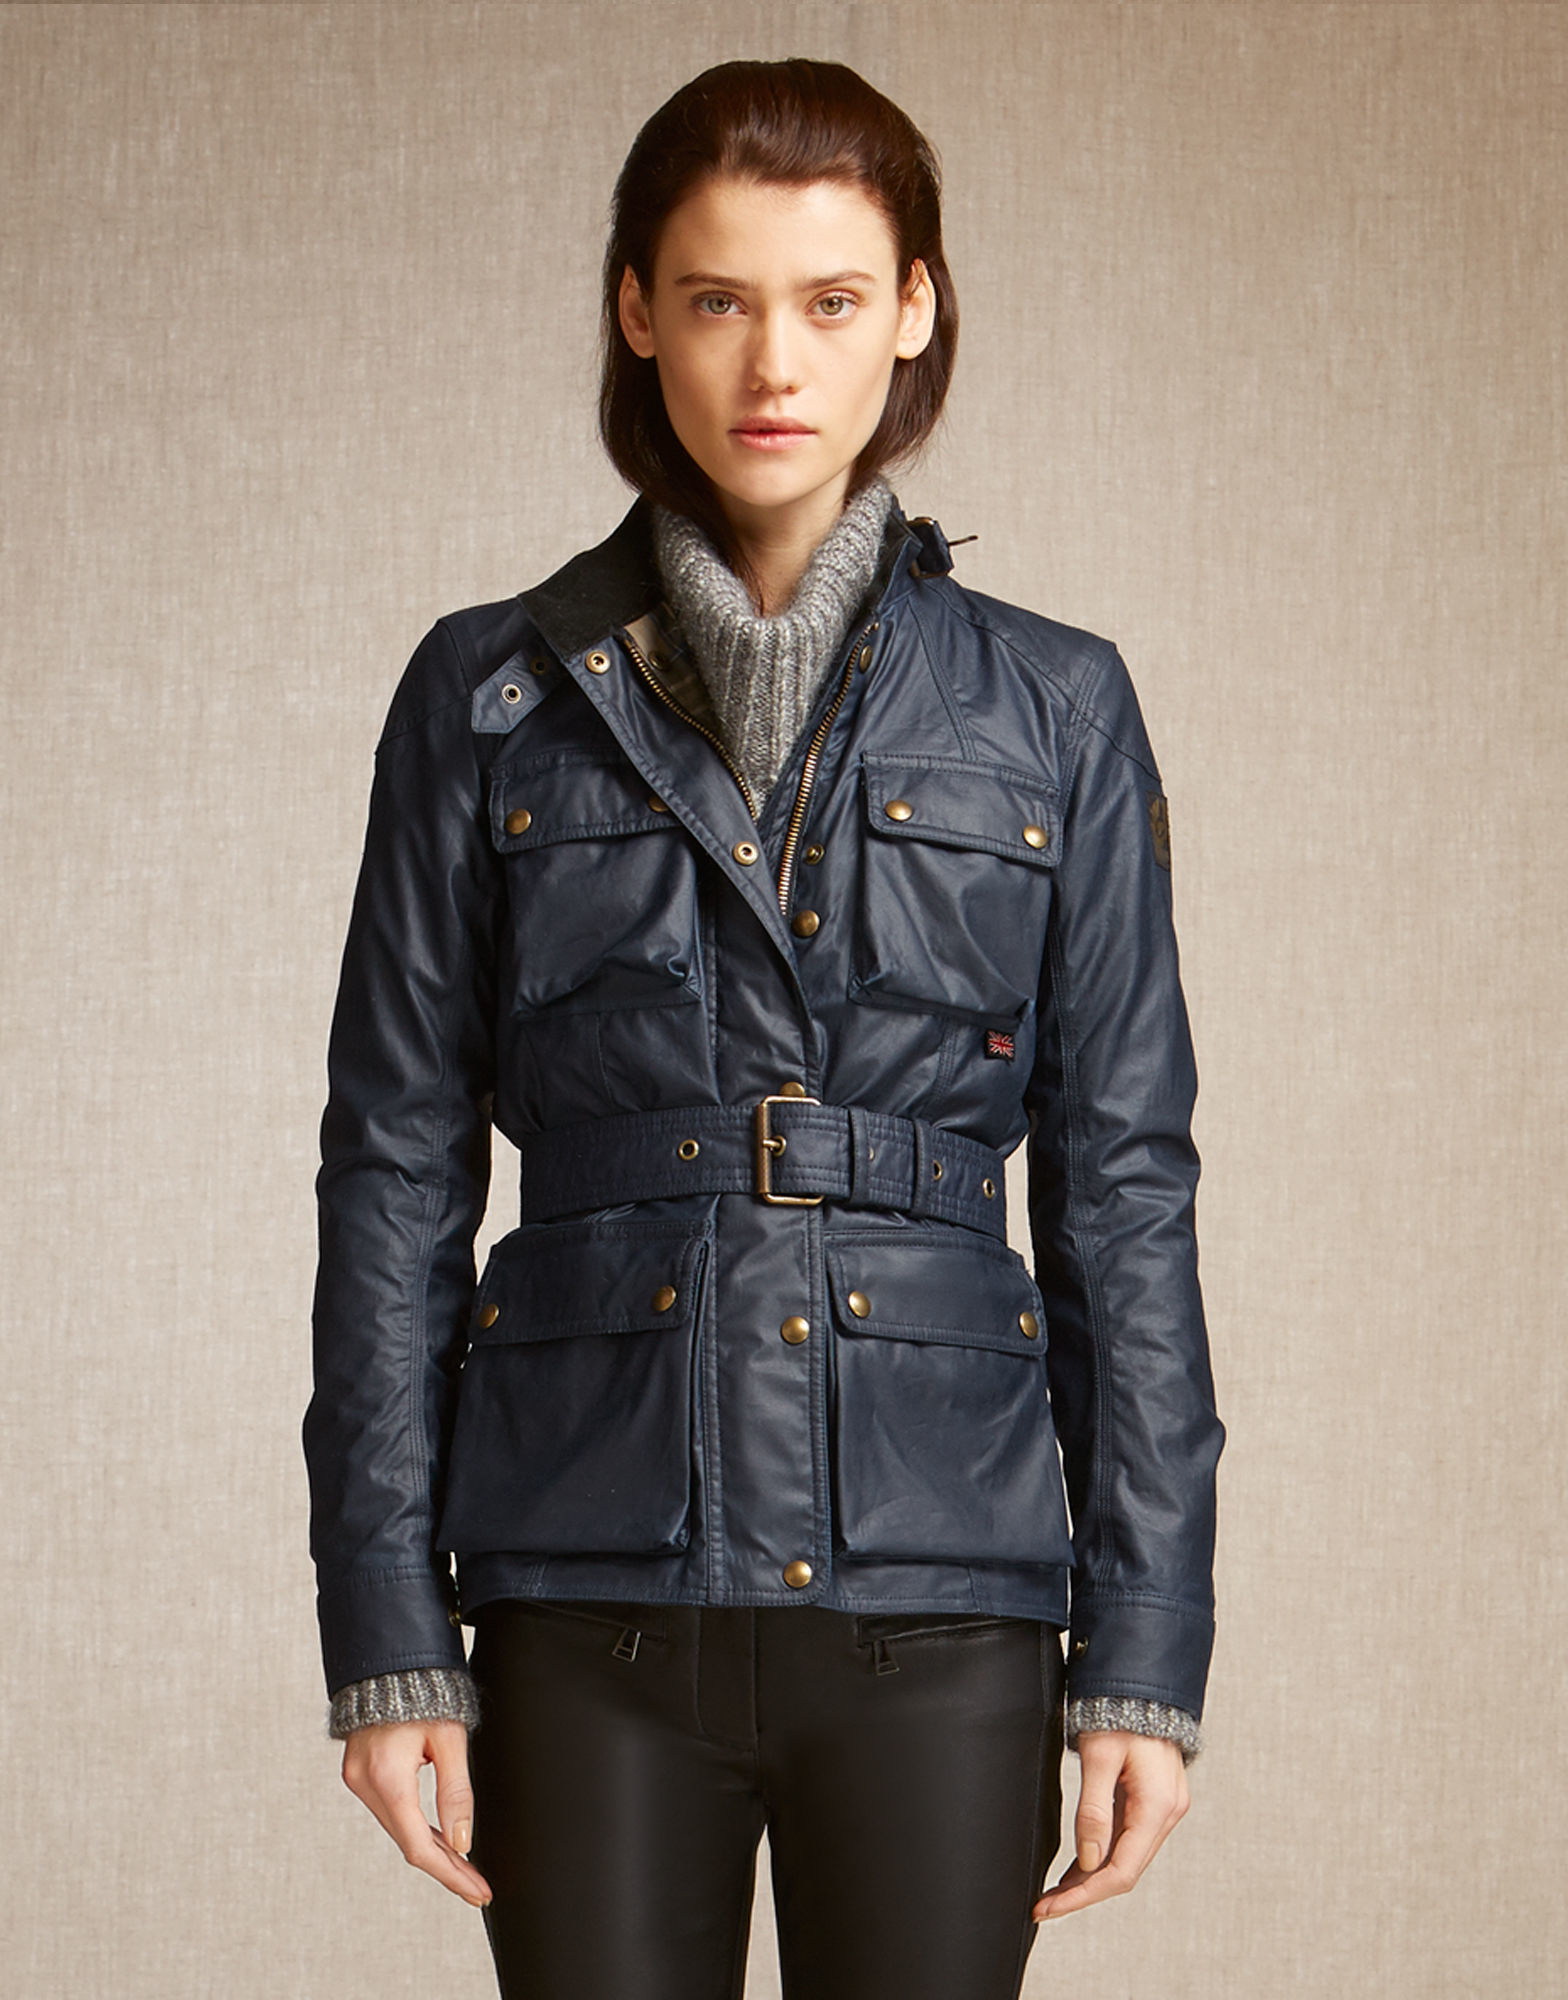 acf9c5a7547 belstaff-winter-blue-the-roadmaster-jacket-blue-product-4-313240715-normal.jpeg